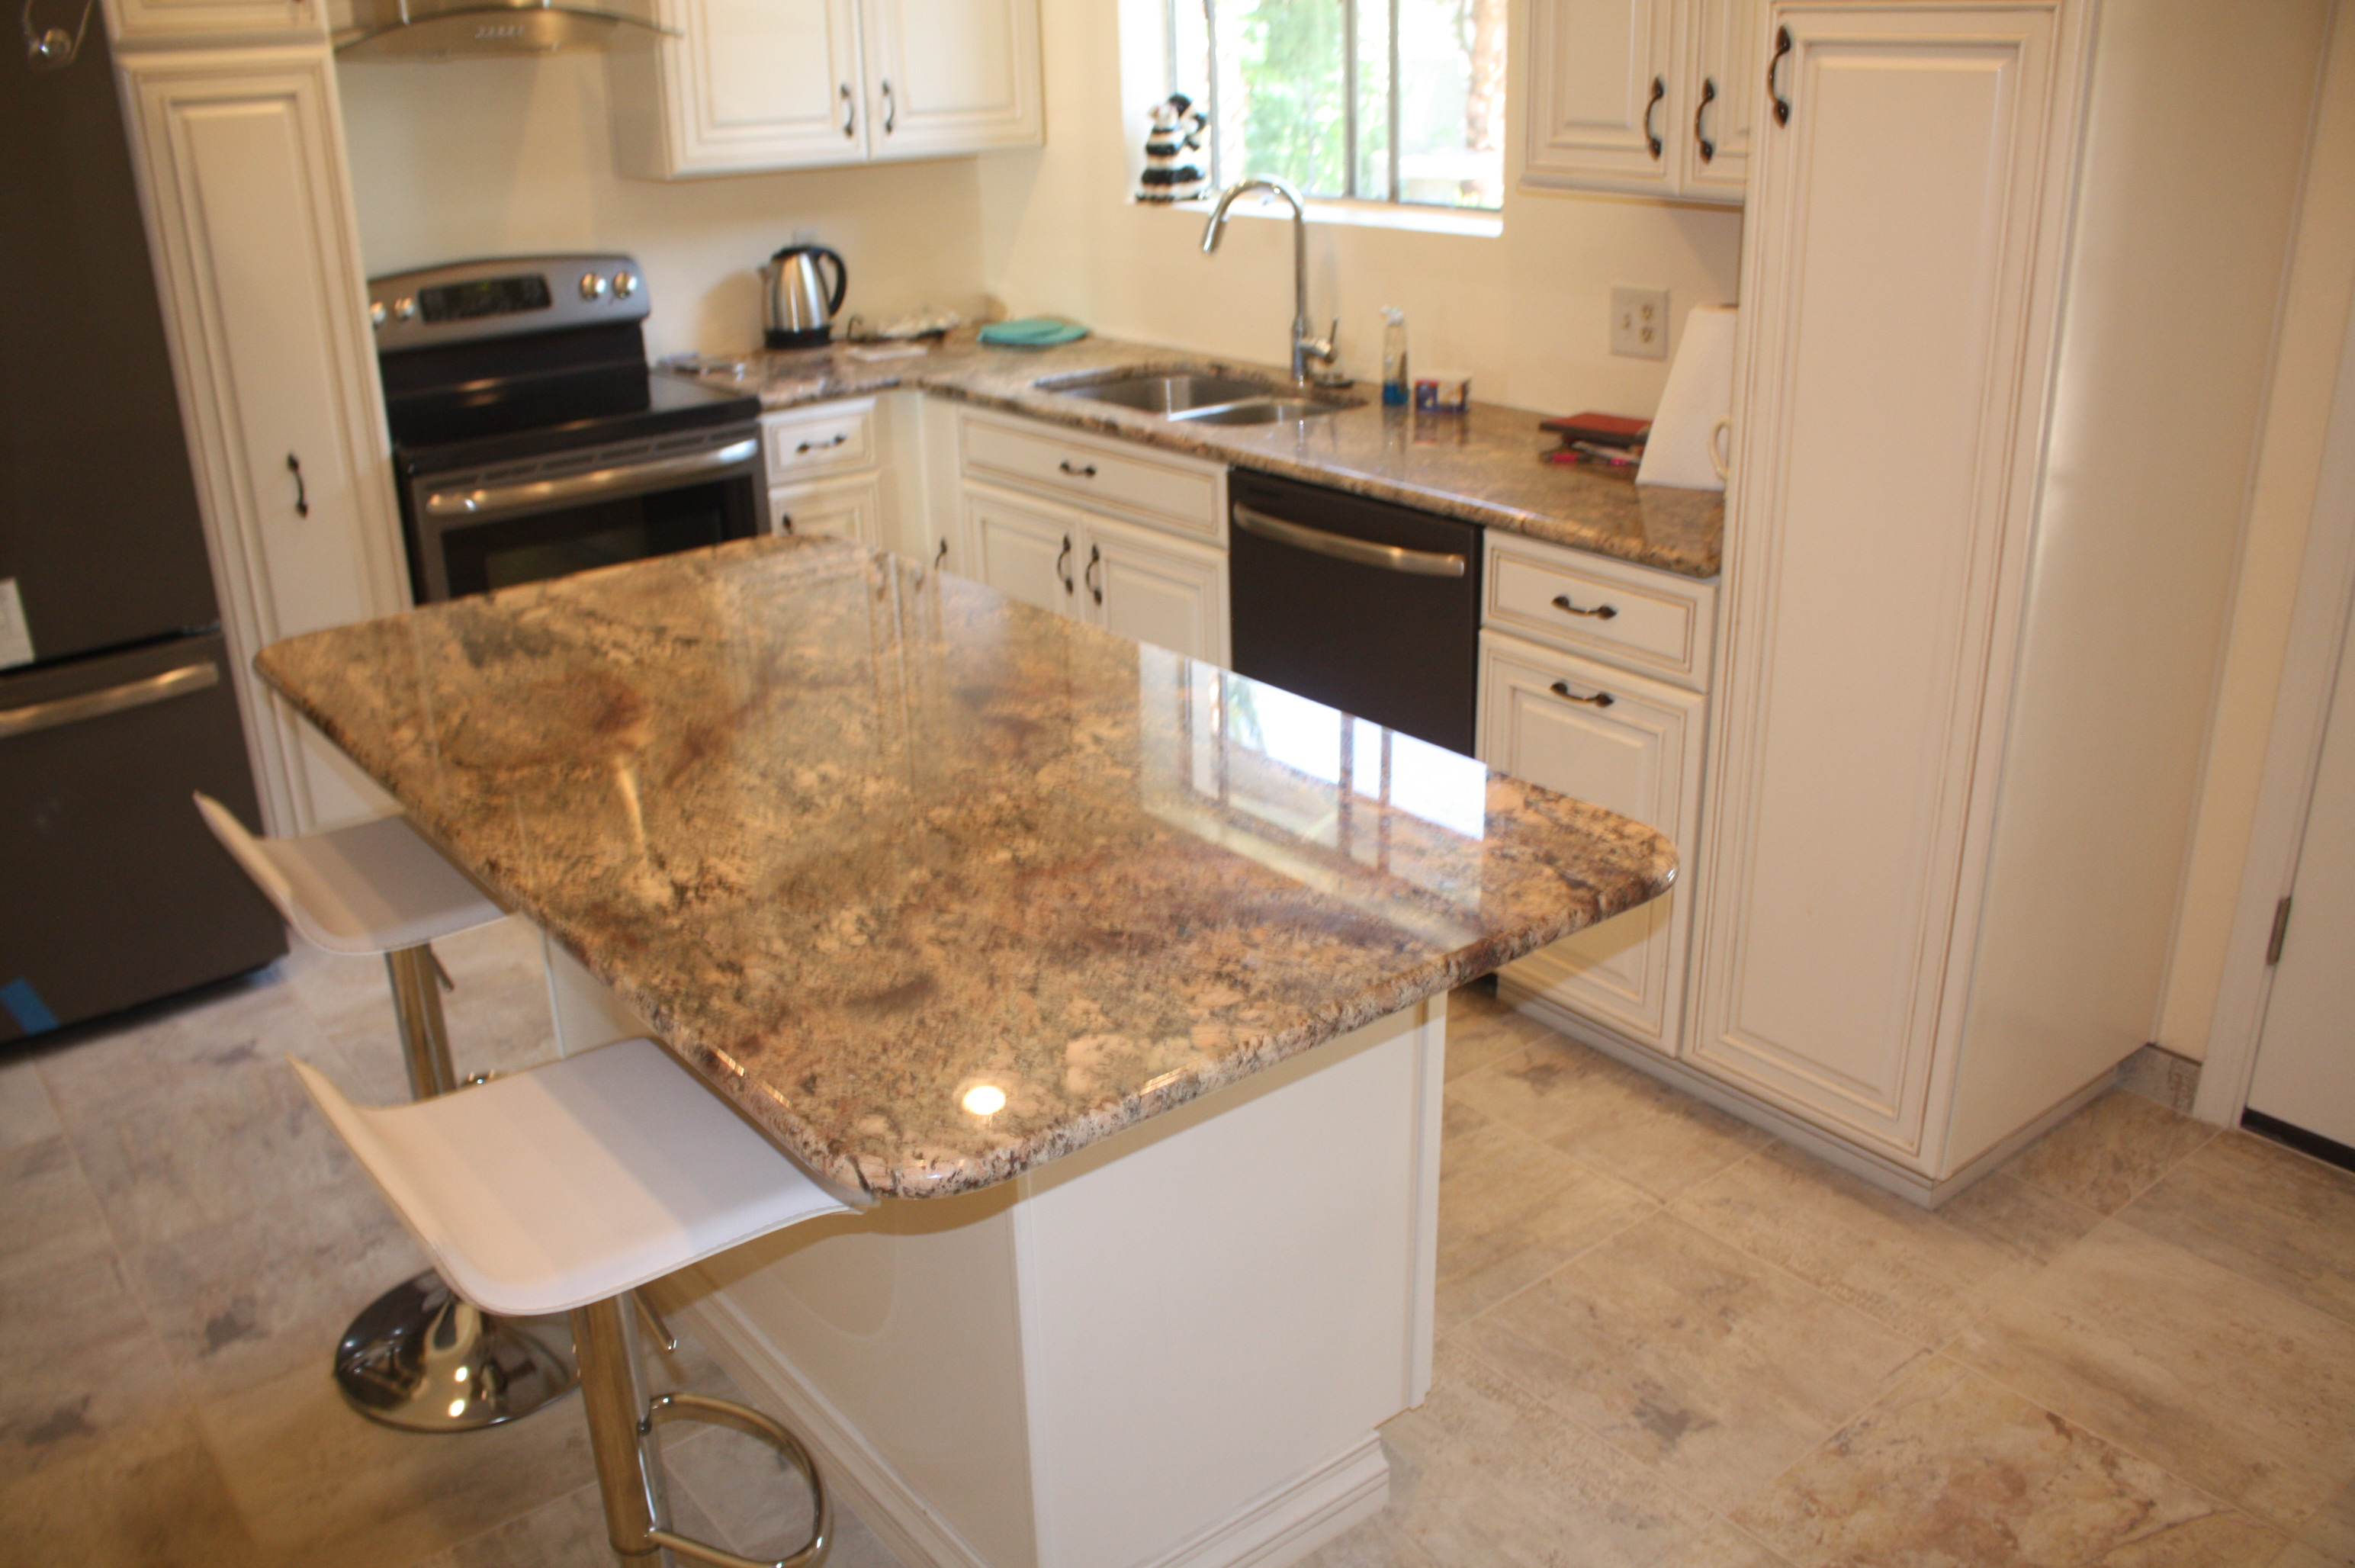 kitchen remodel gallery - urias custom remodeling